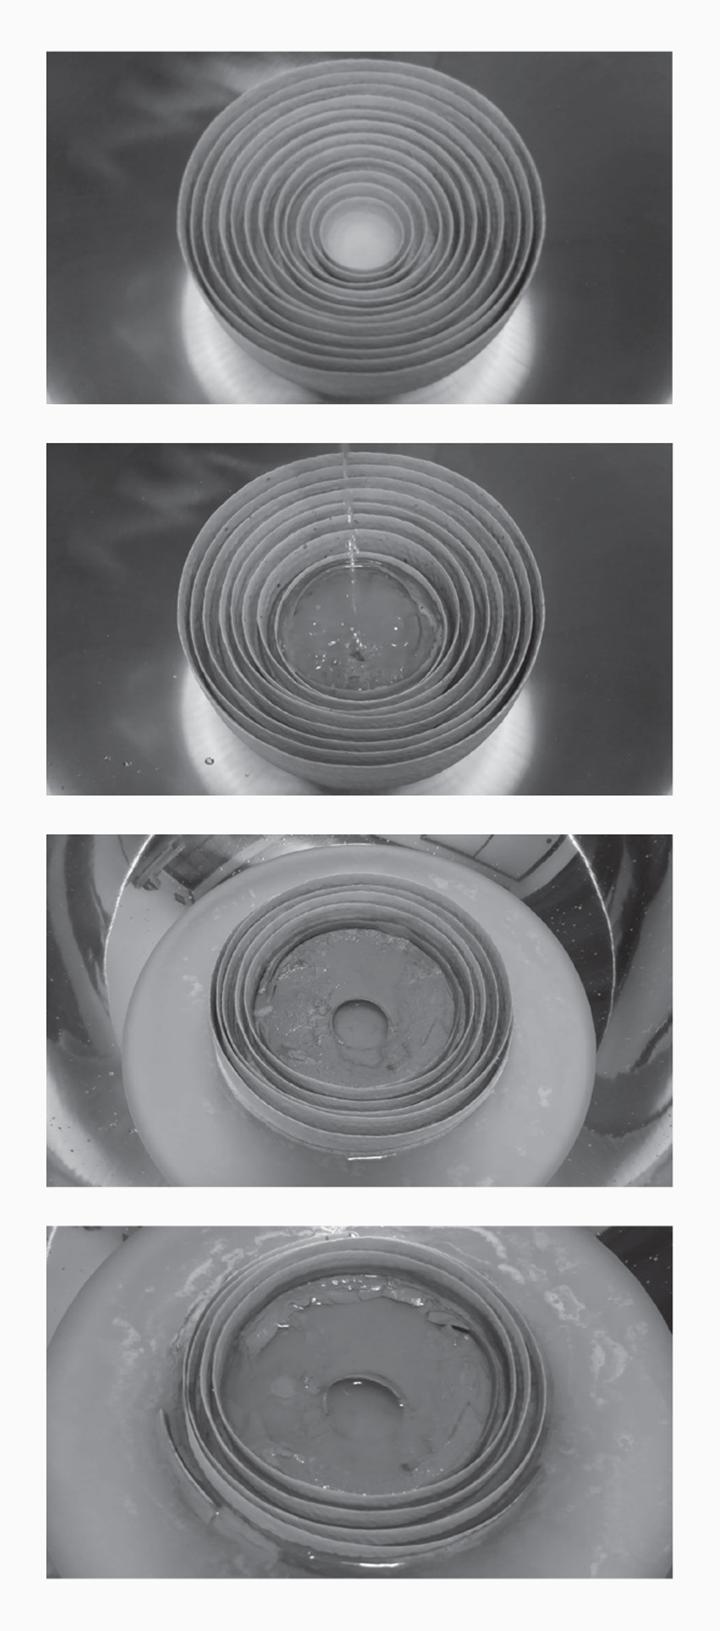 Albert Yonathan Setyawan, Metaphor of the Human Condition: Meditation on Silence—The Dissolving Bowl (2015) (still). Video. 60 min. Courtesy Mizuma Gallery, Singapore/Tokyo.